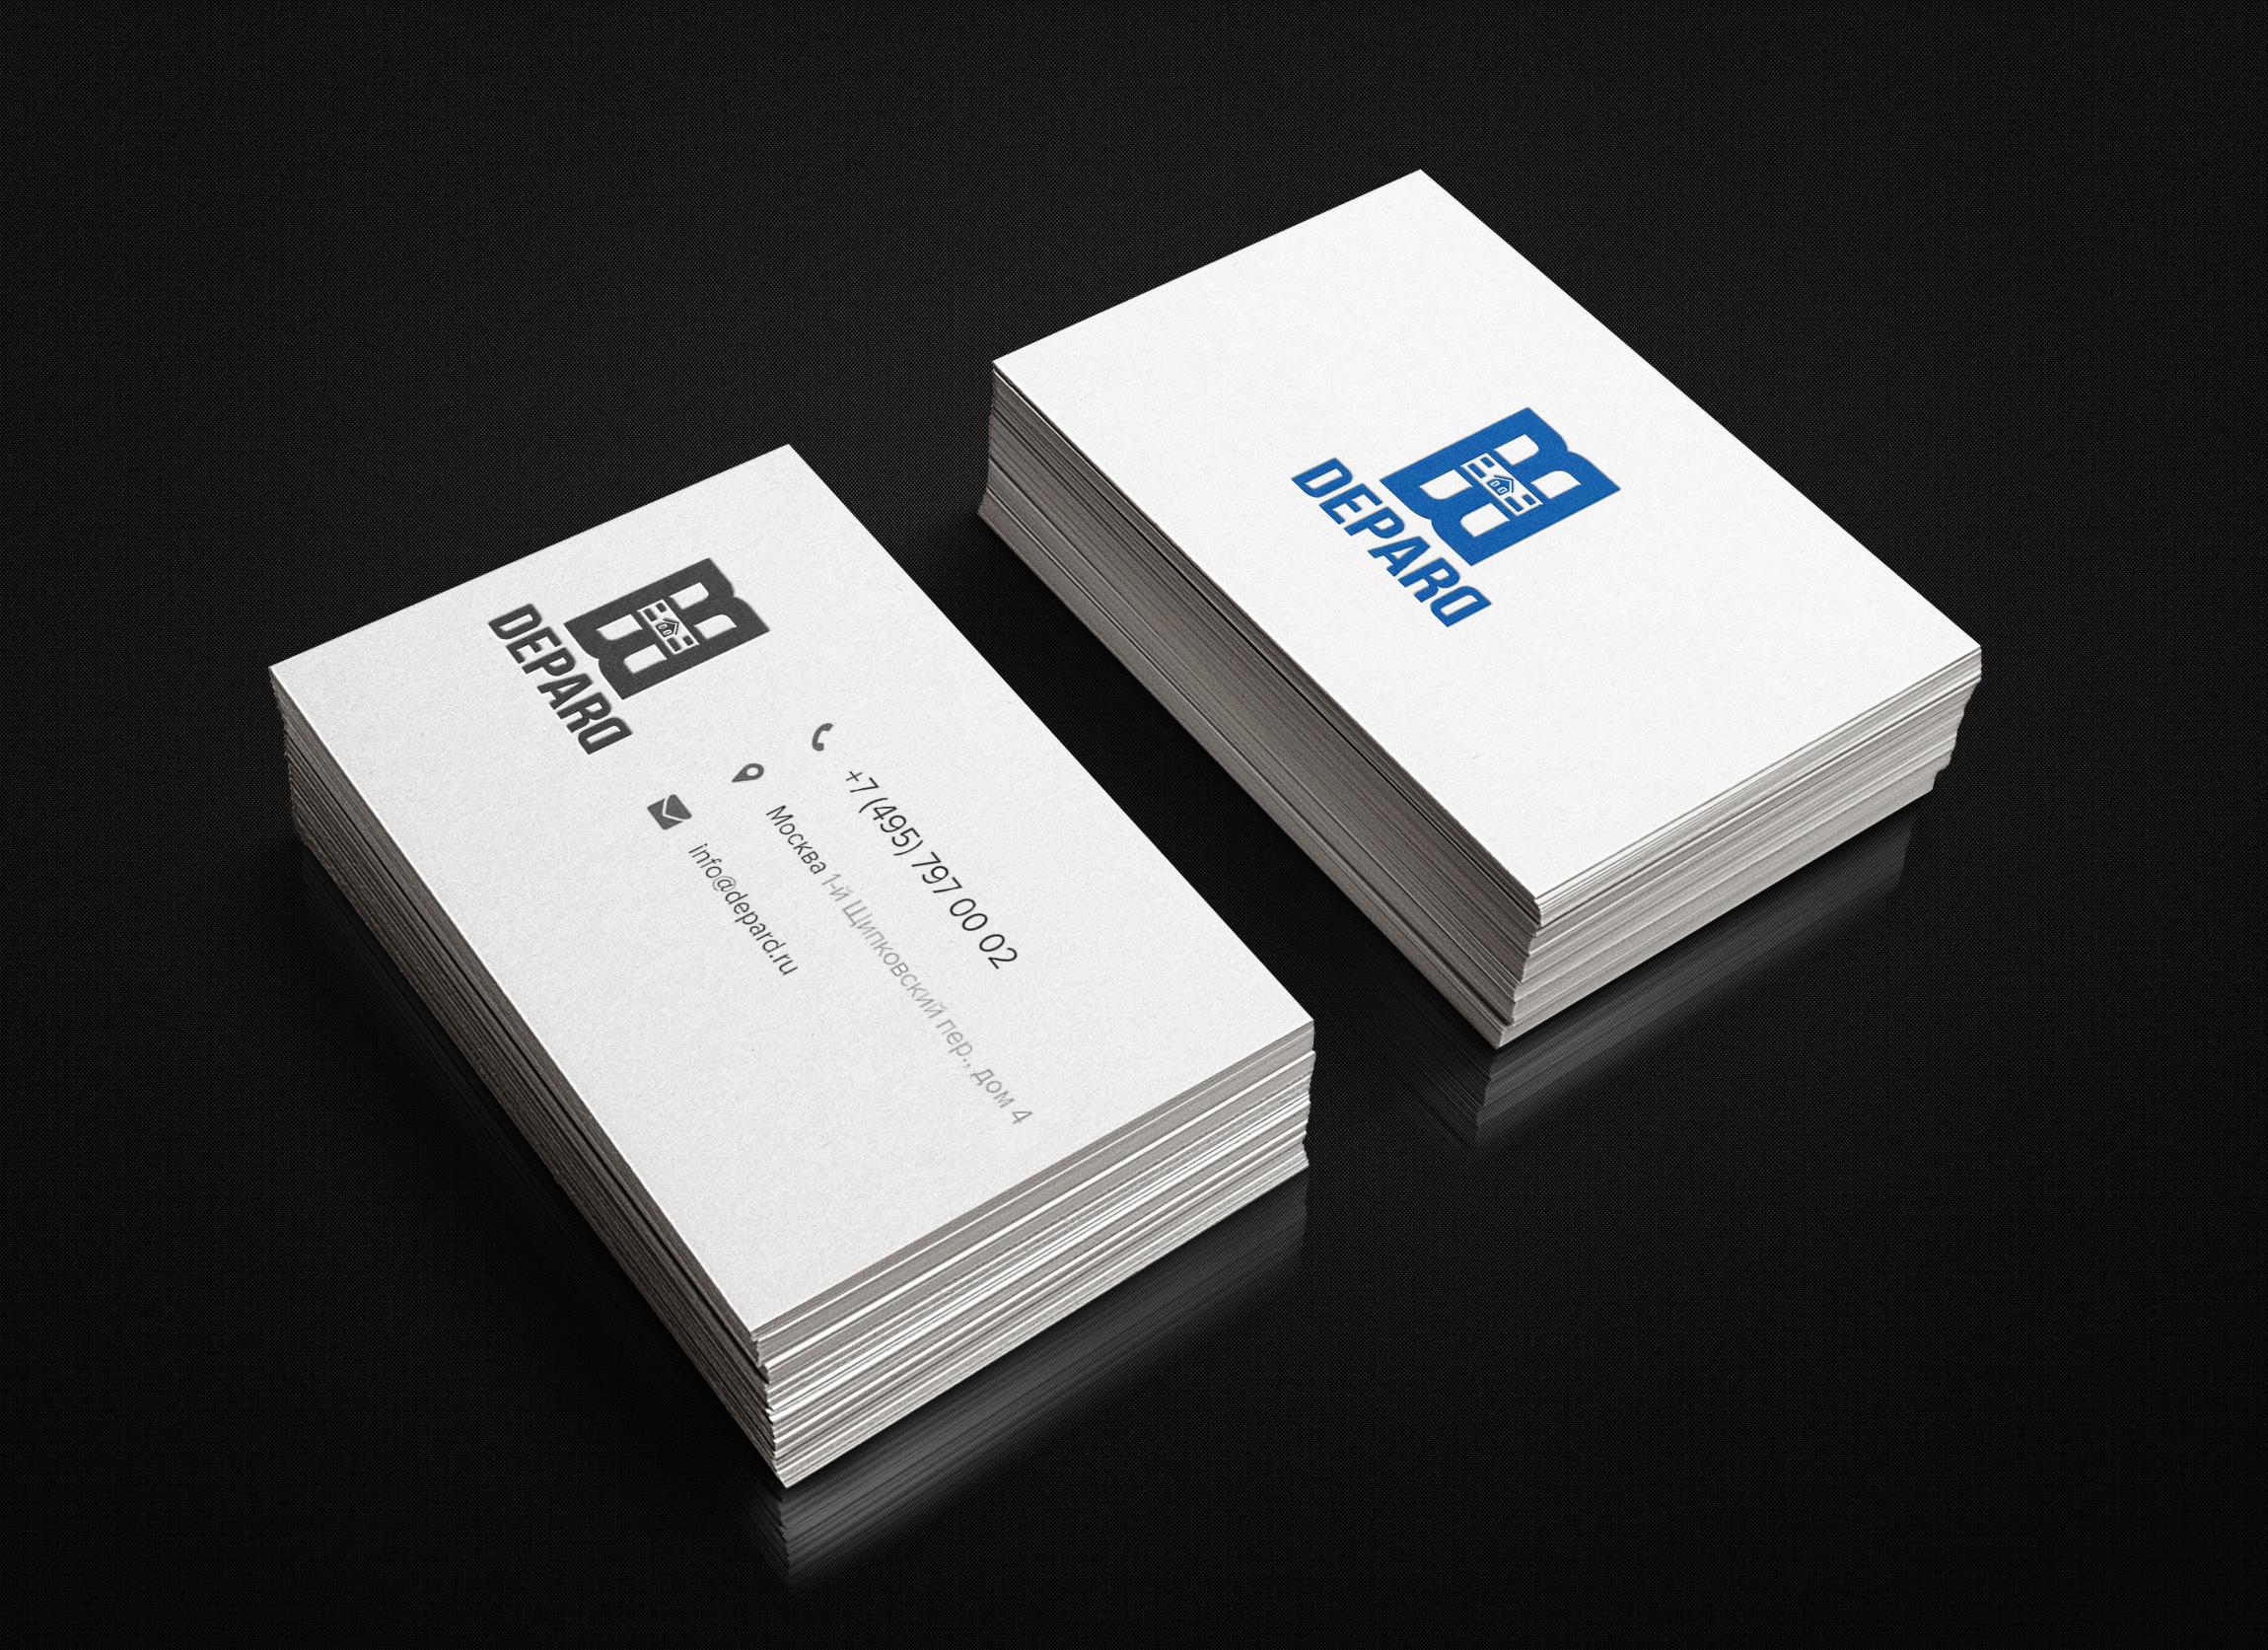 Логотип для компании (услуги недвижимость) фото f_8715934a4149d016.jpg